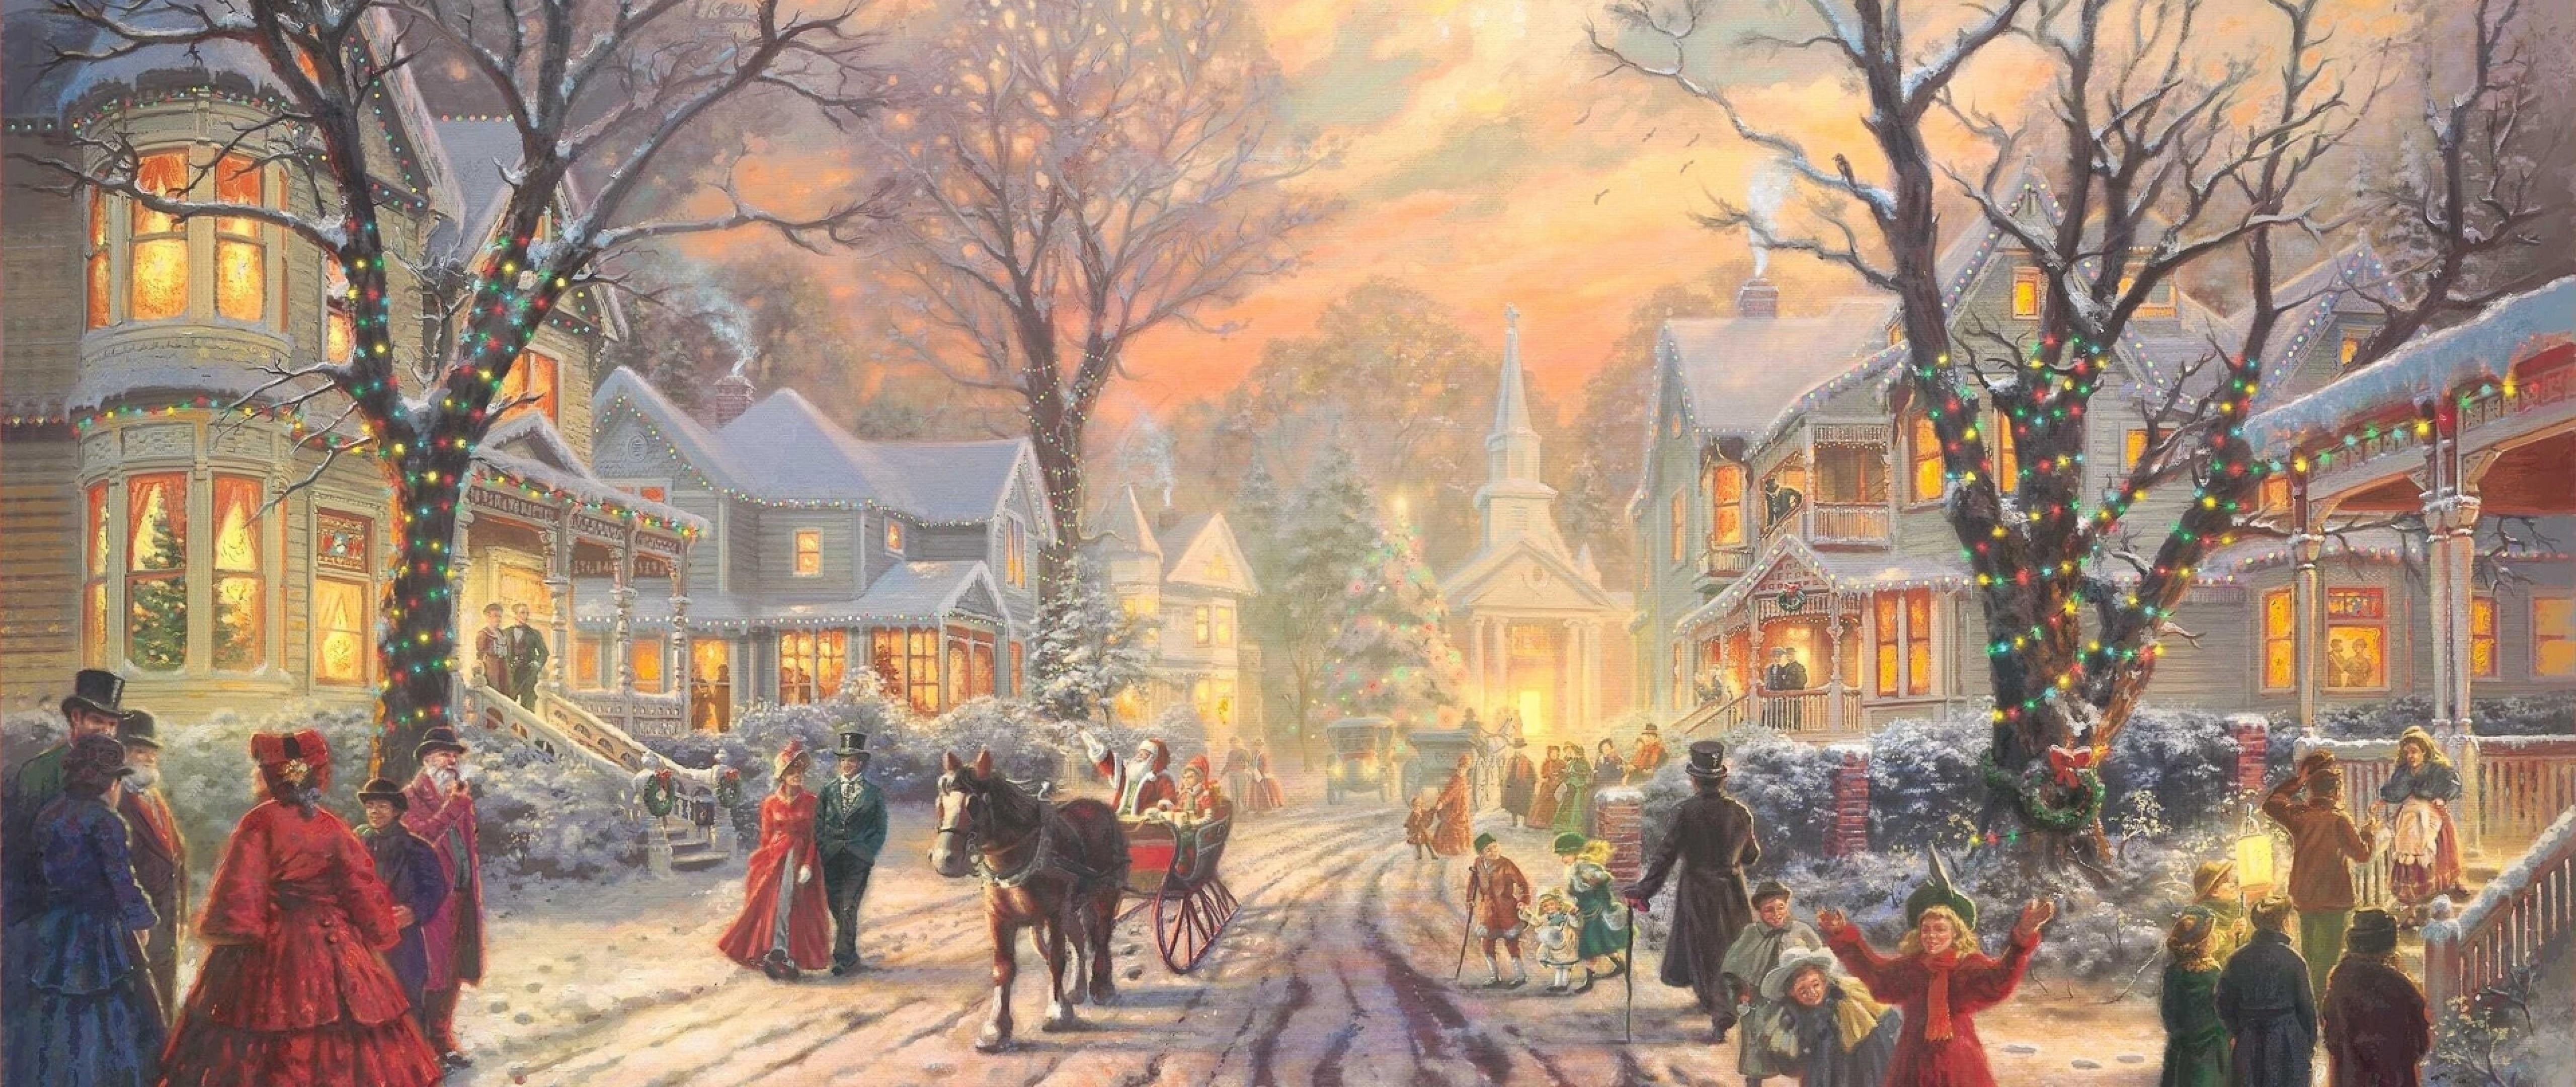 People celebrating Christmas HD Wallpaper 4K Ultra HD Wide ...